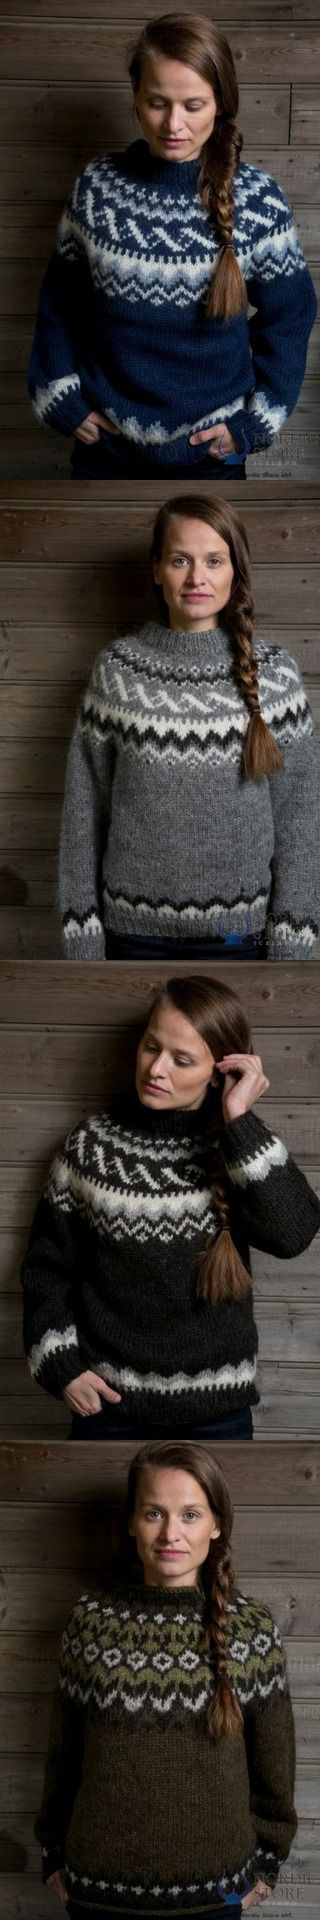 Love my Icelandic sweater so much